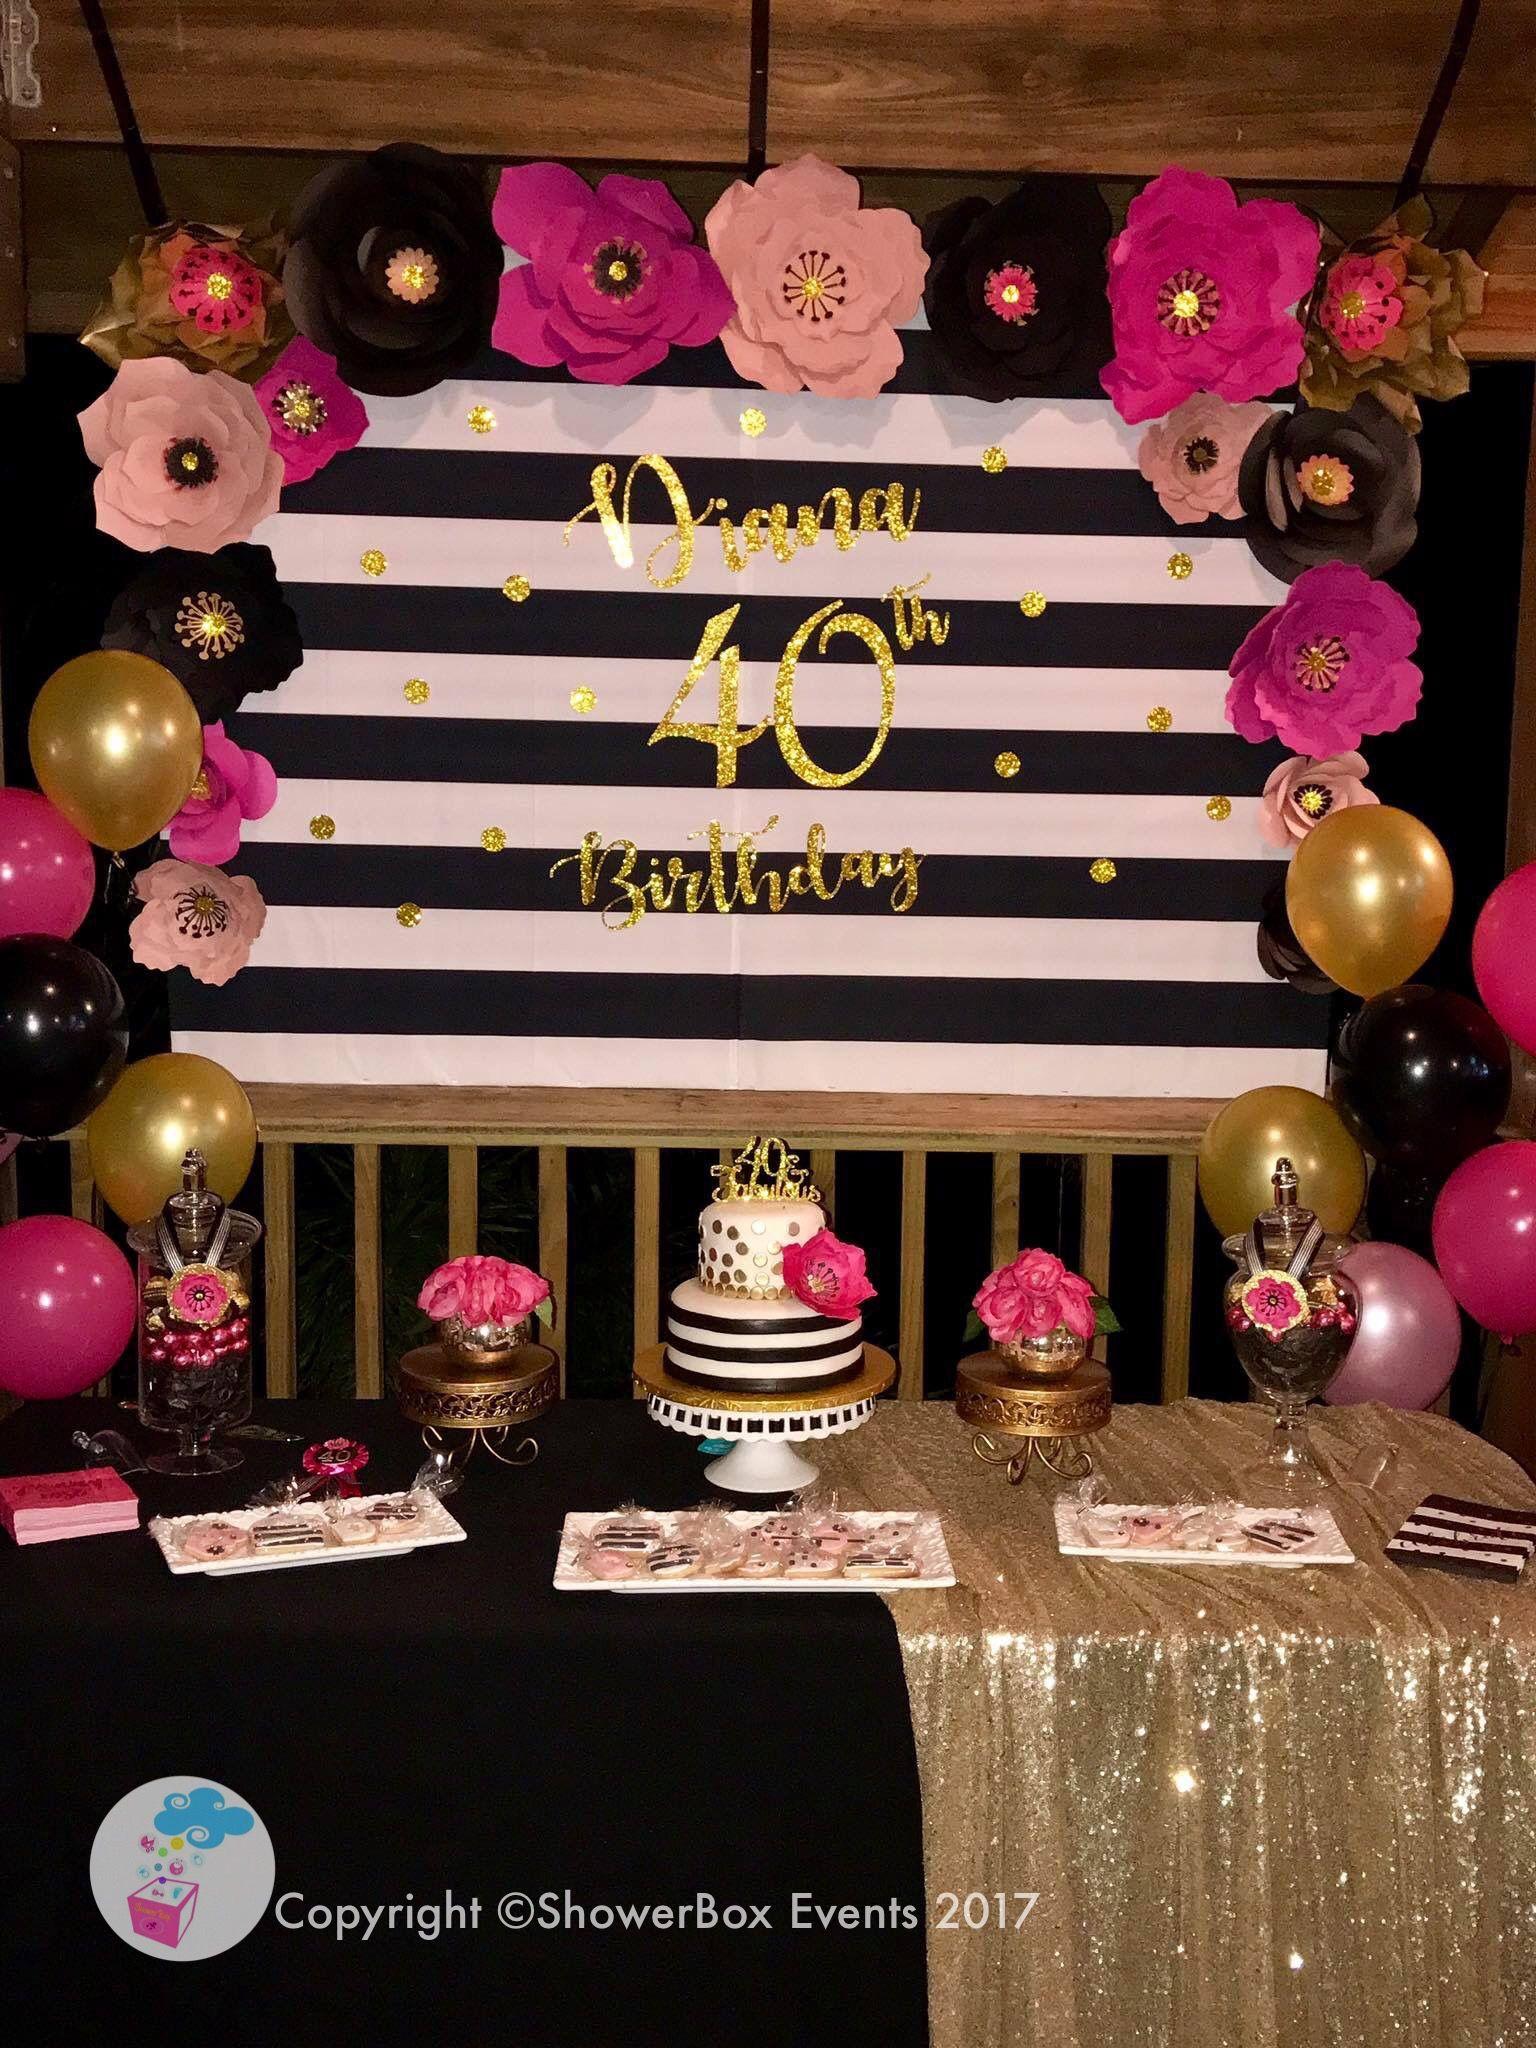 40th Birthday Showerbox Events 2017 Like Us On Fb Myshowerbox Showerboxdesigns Sh 40th Birthday Decorations 40th Birthday Party Themes 40th Birthday Parties